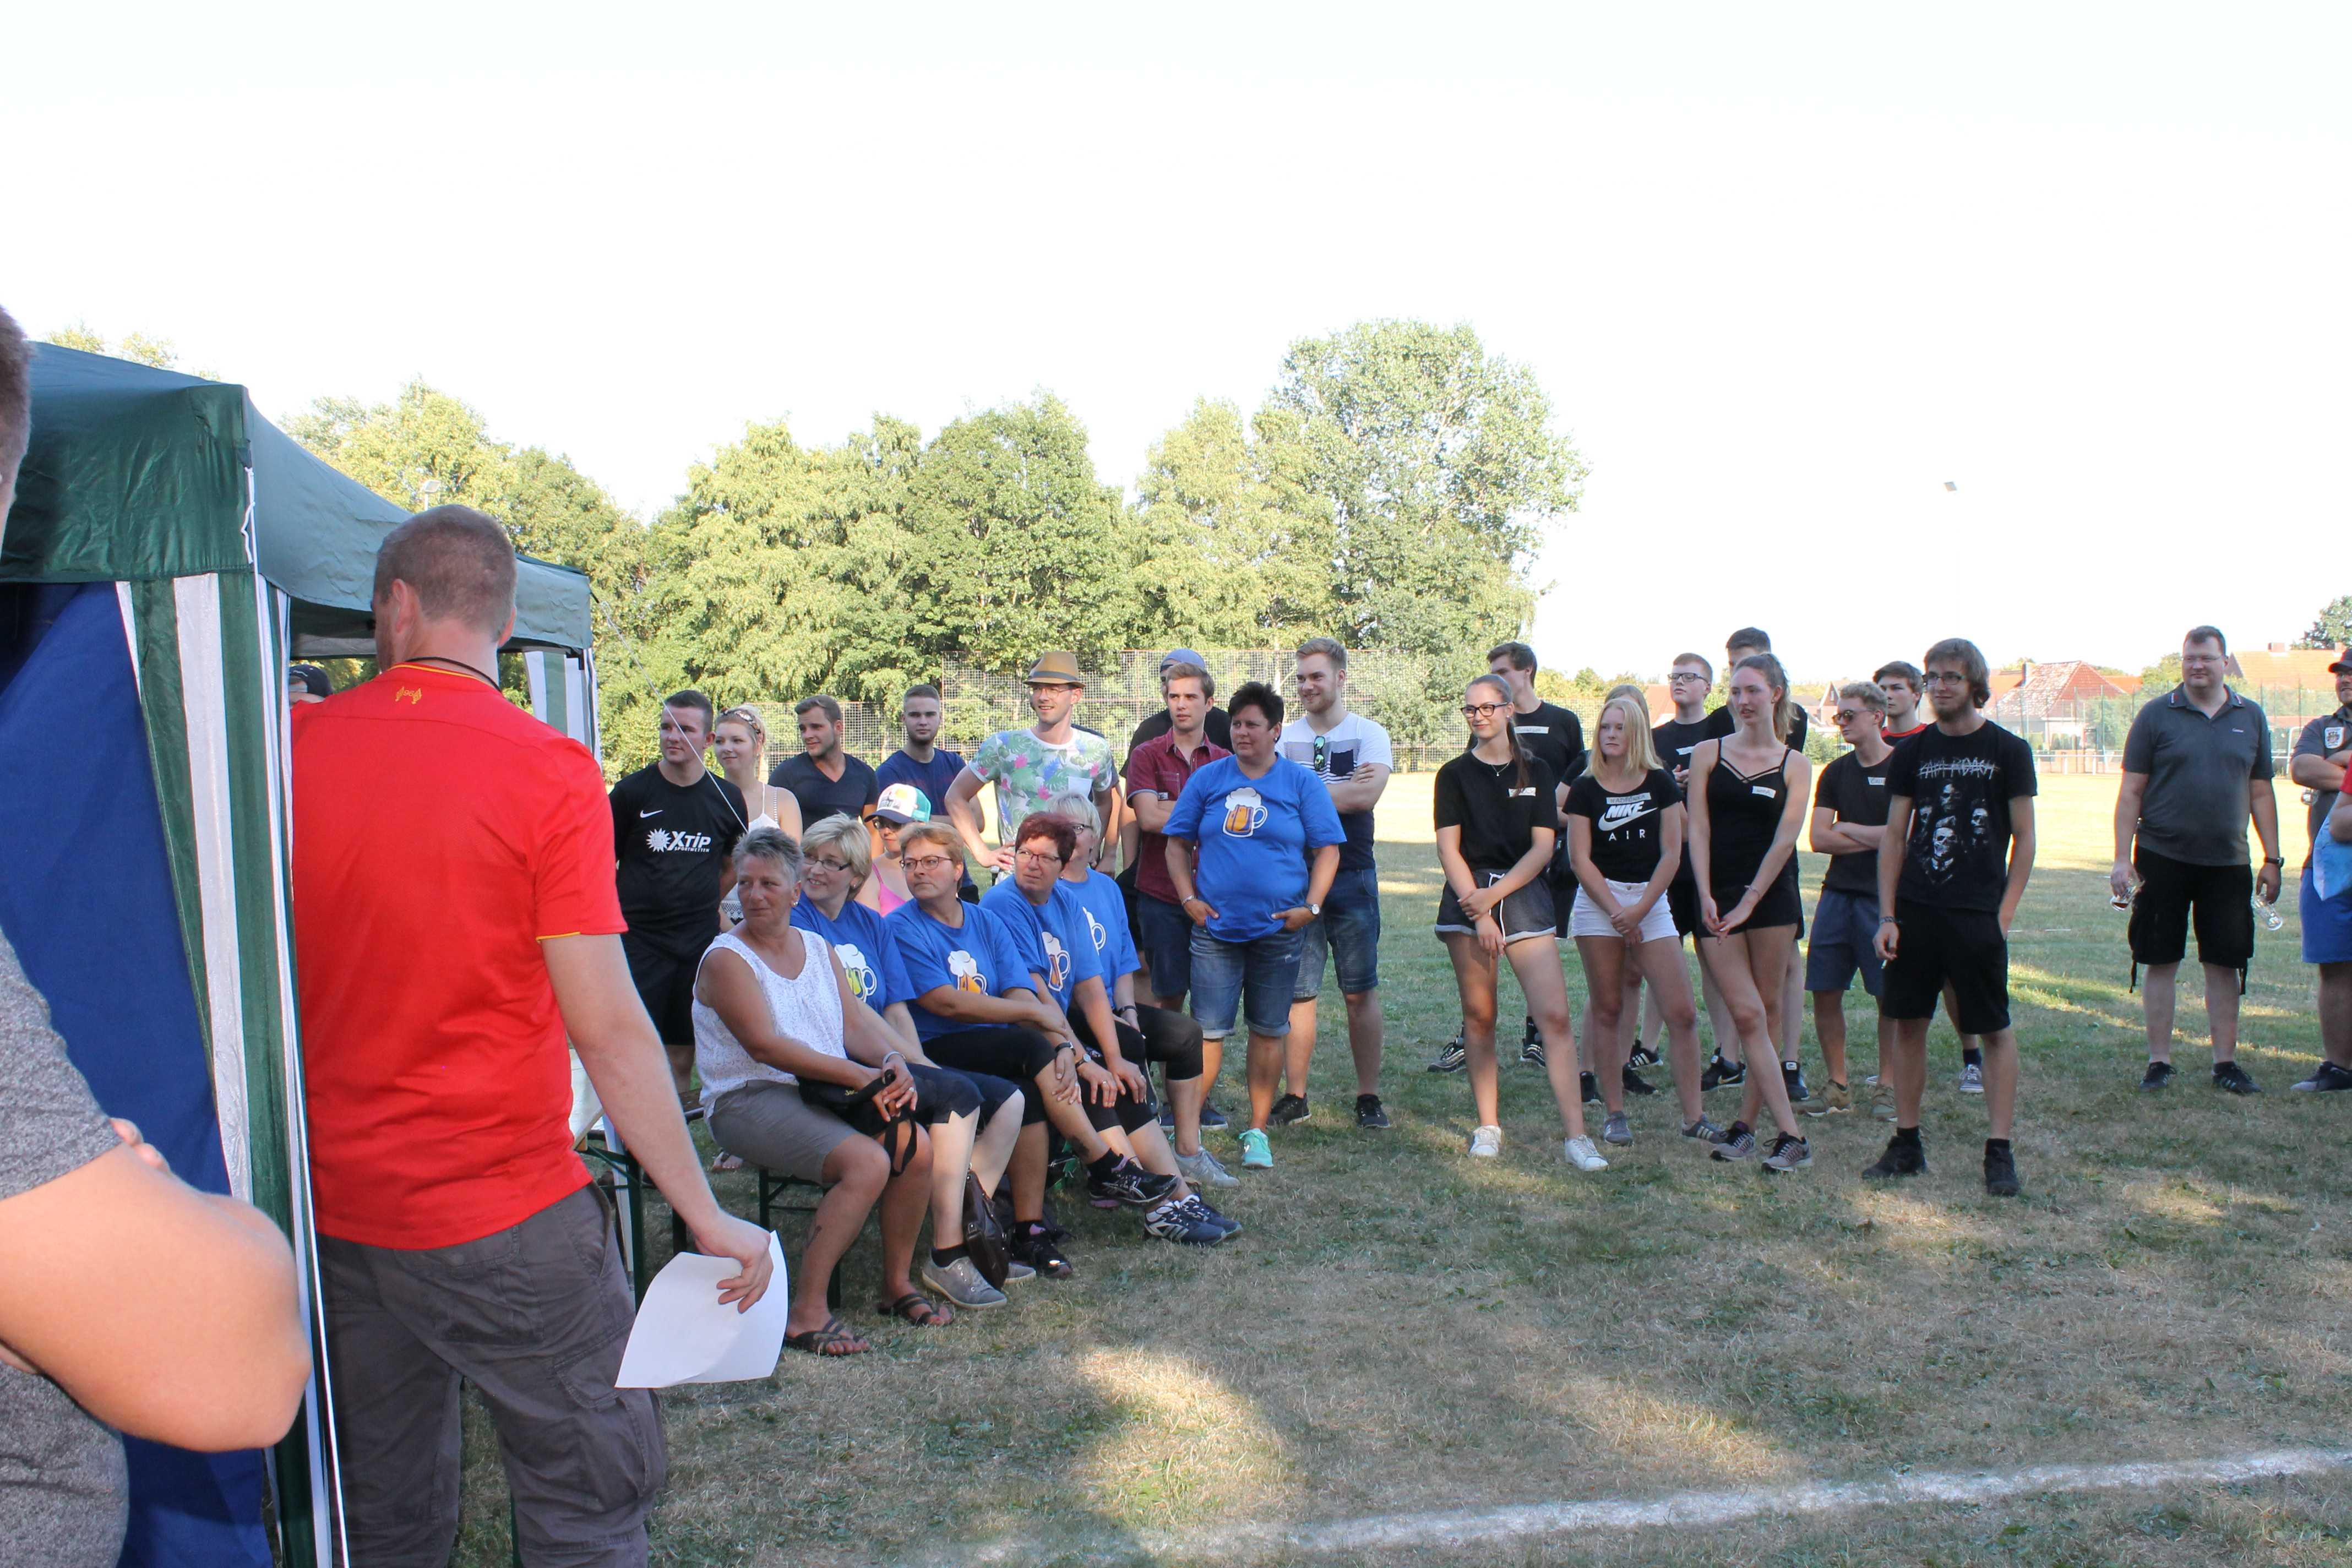 2018-07-27 Sportwoche - Flunkyball Turnier (3)